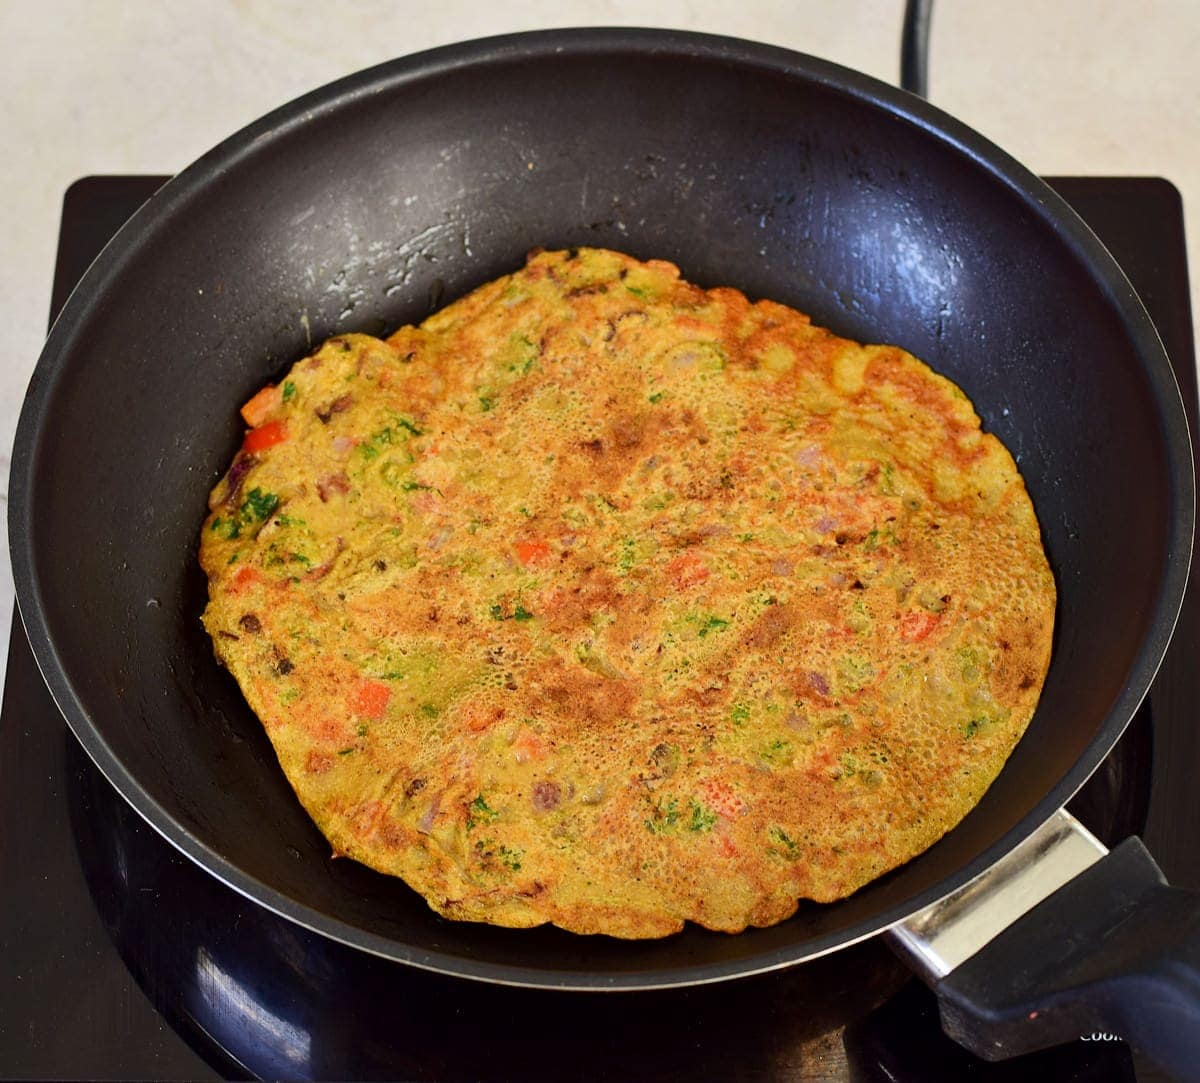 vegan omelette in black pan